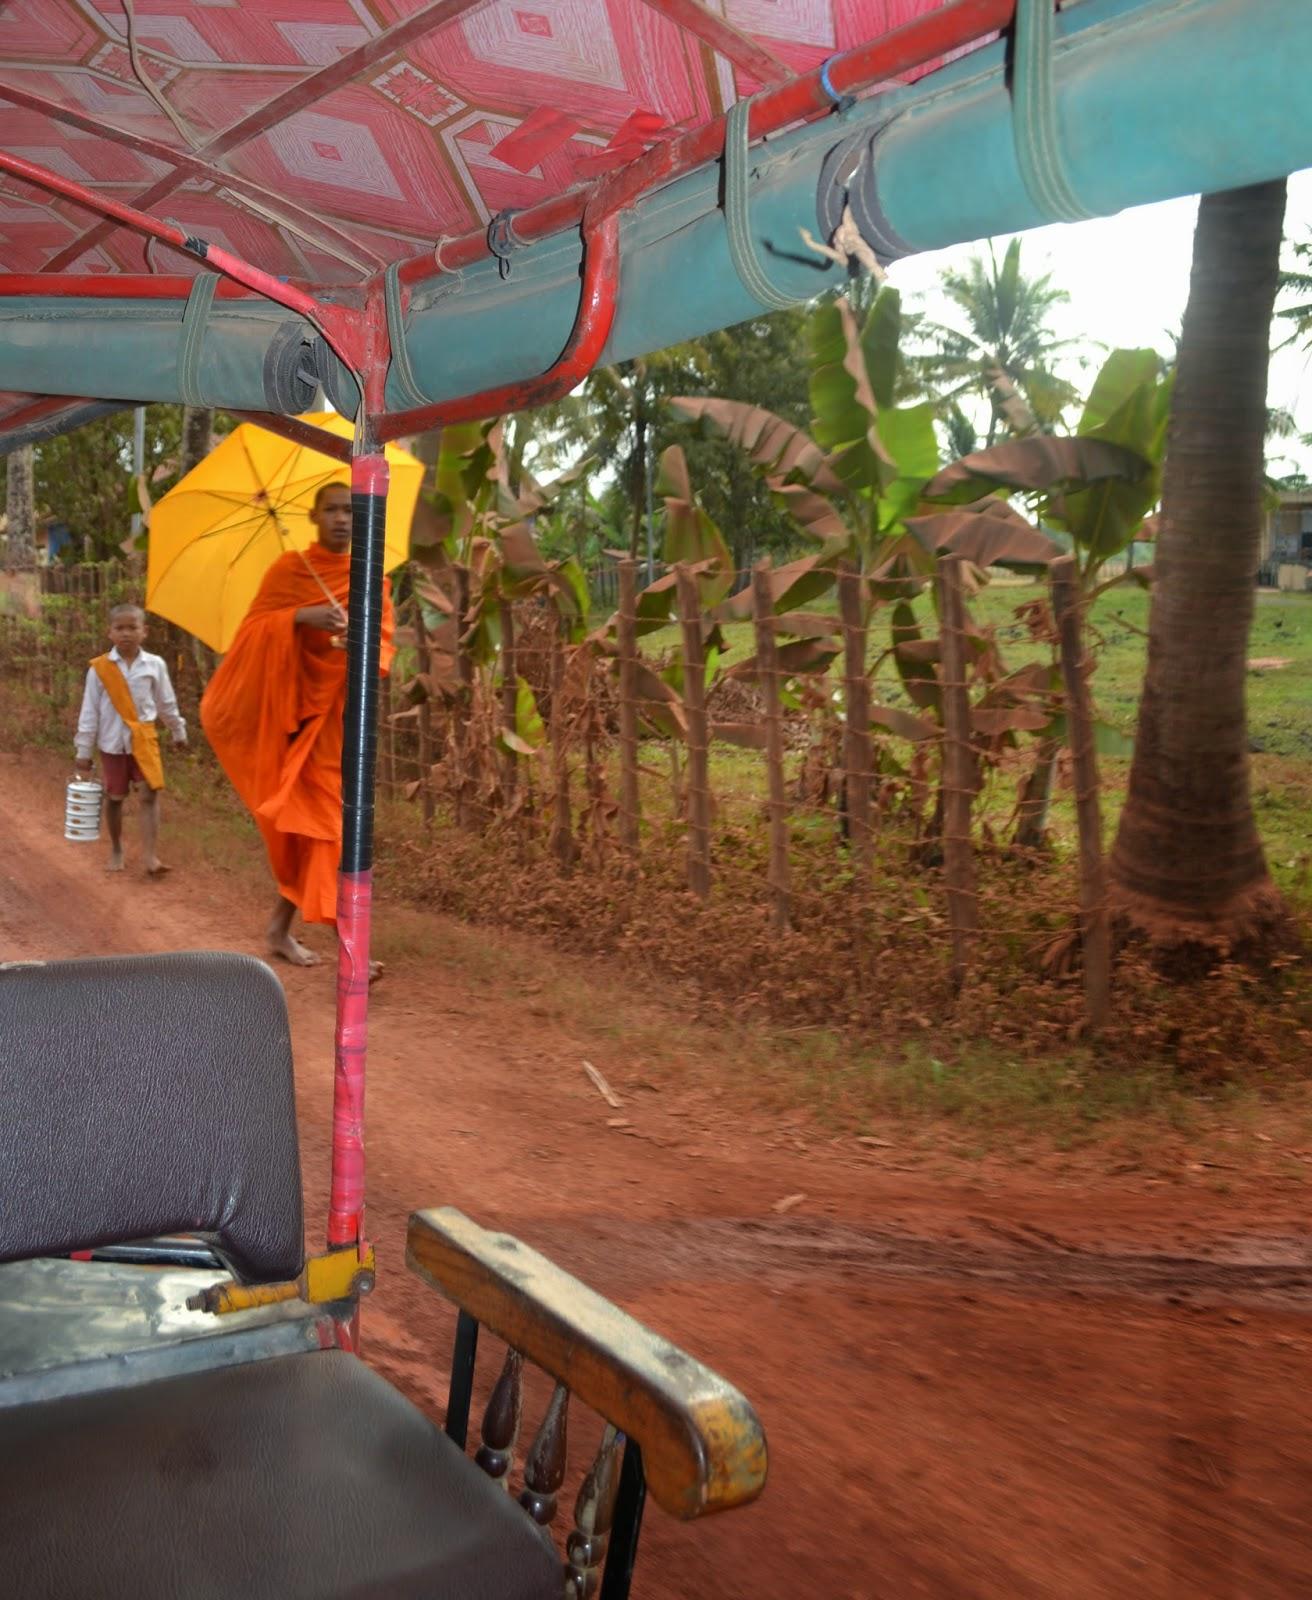 kampot countryside cambodia